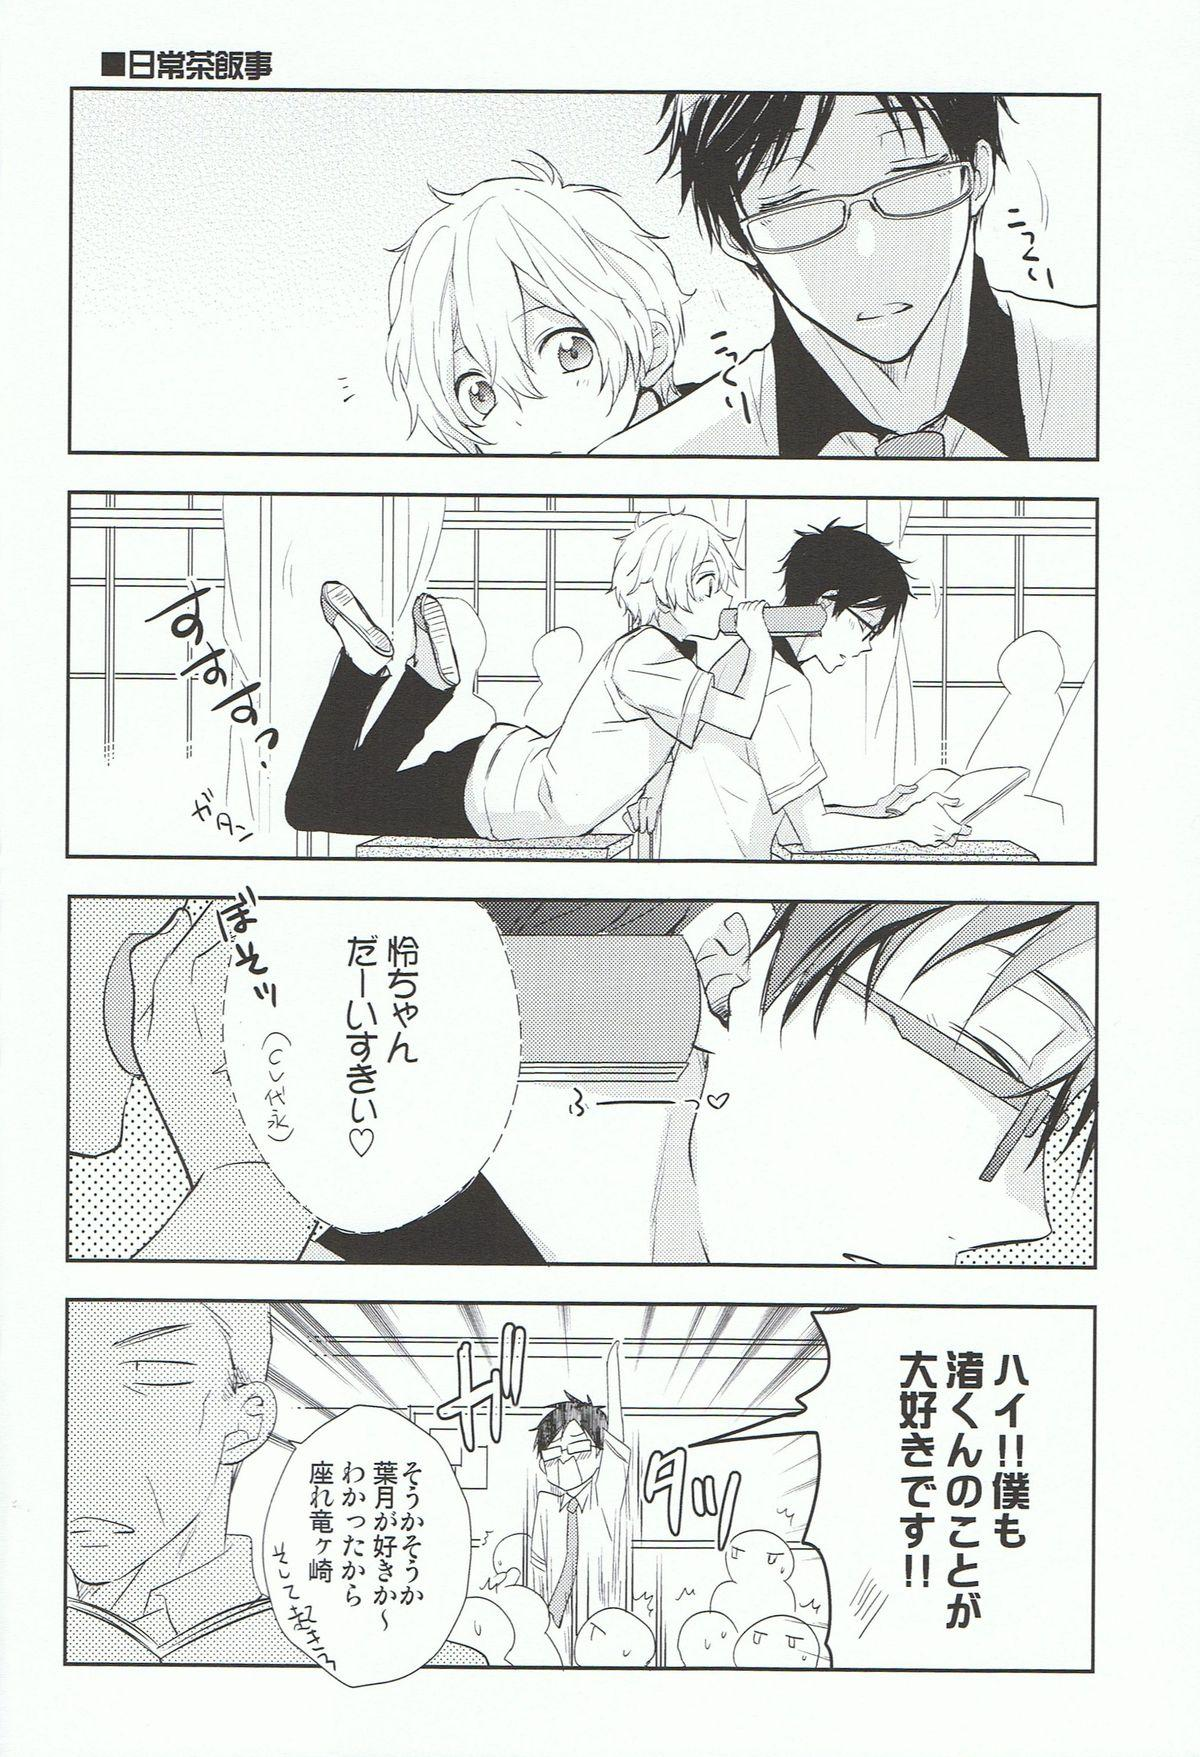 Nagisa-kun de ii deshou! 18